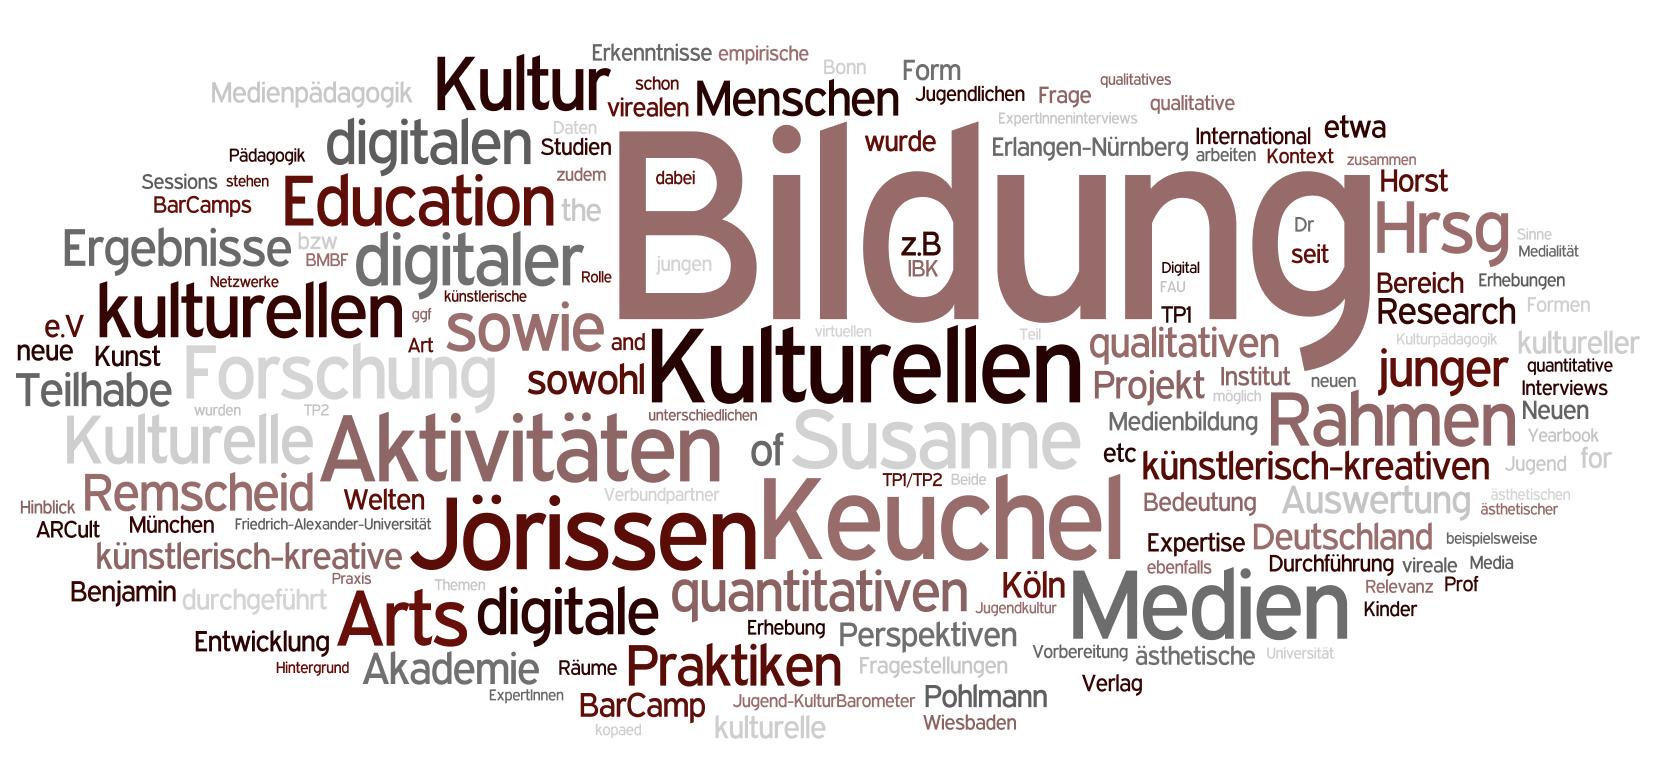 "BMBF-gefördertes Projekt ""Postdigitale Kulturelle Jugendwelten"" startet"